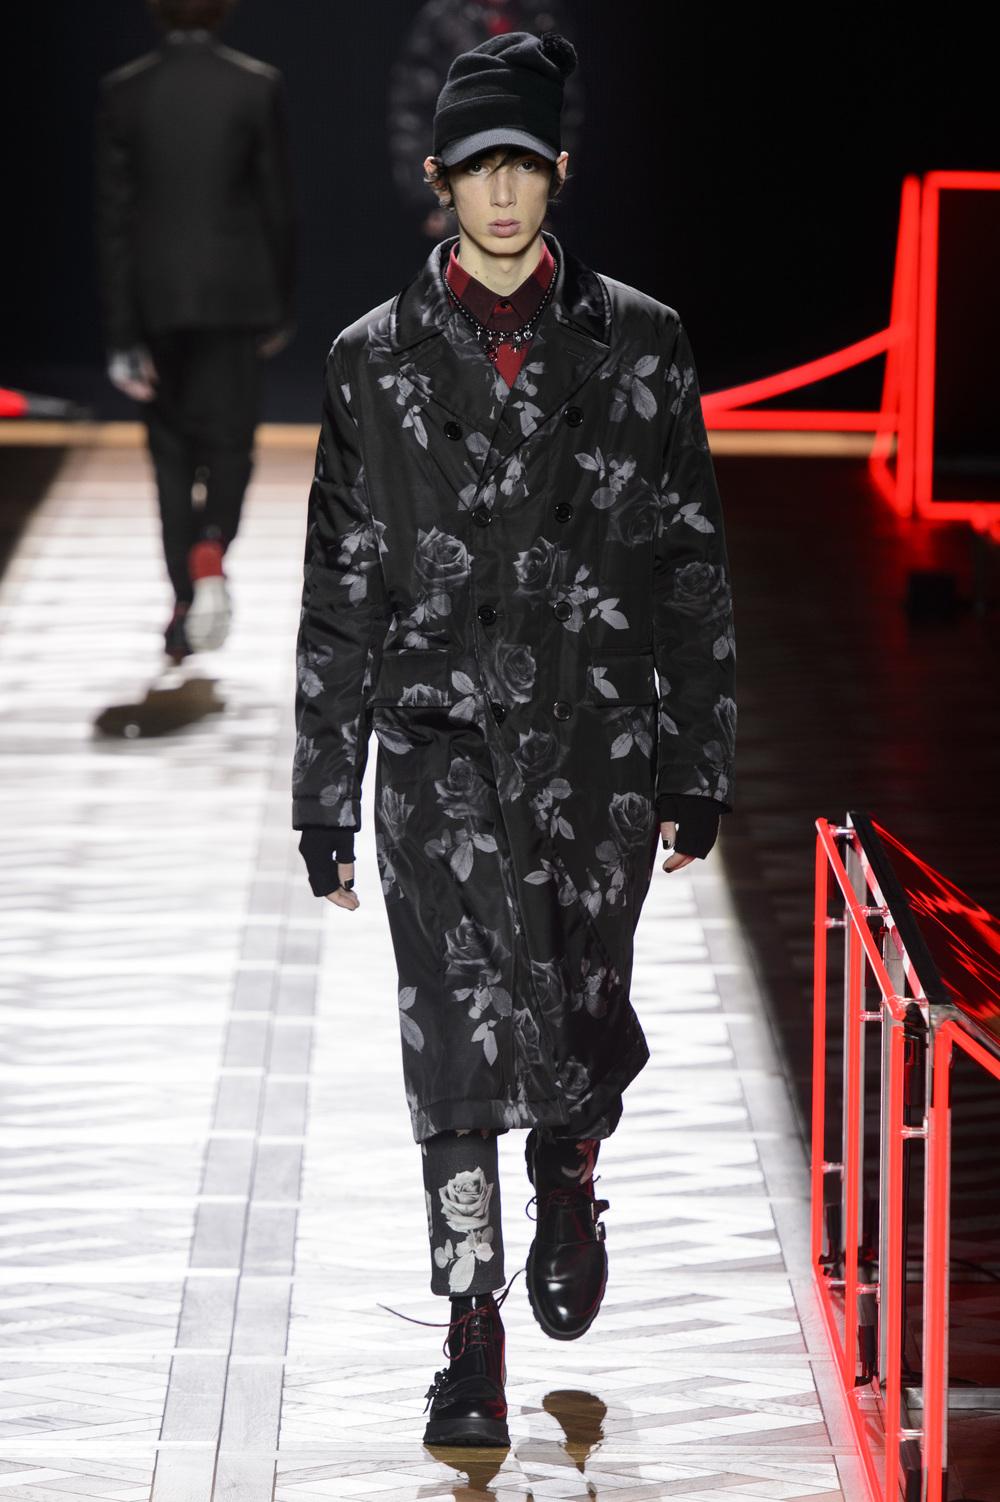 Dior_Homme_Hiver2016-17_look_41.JPG